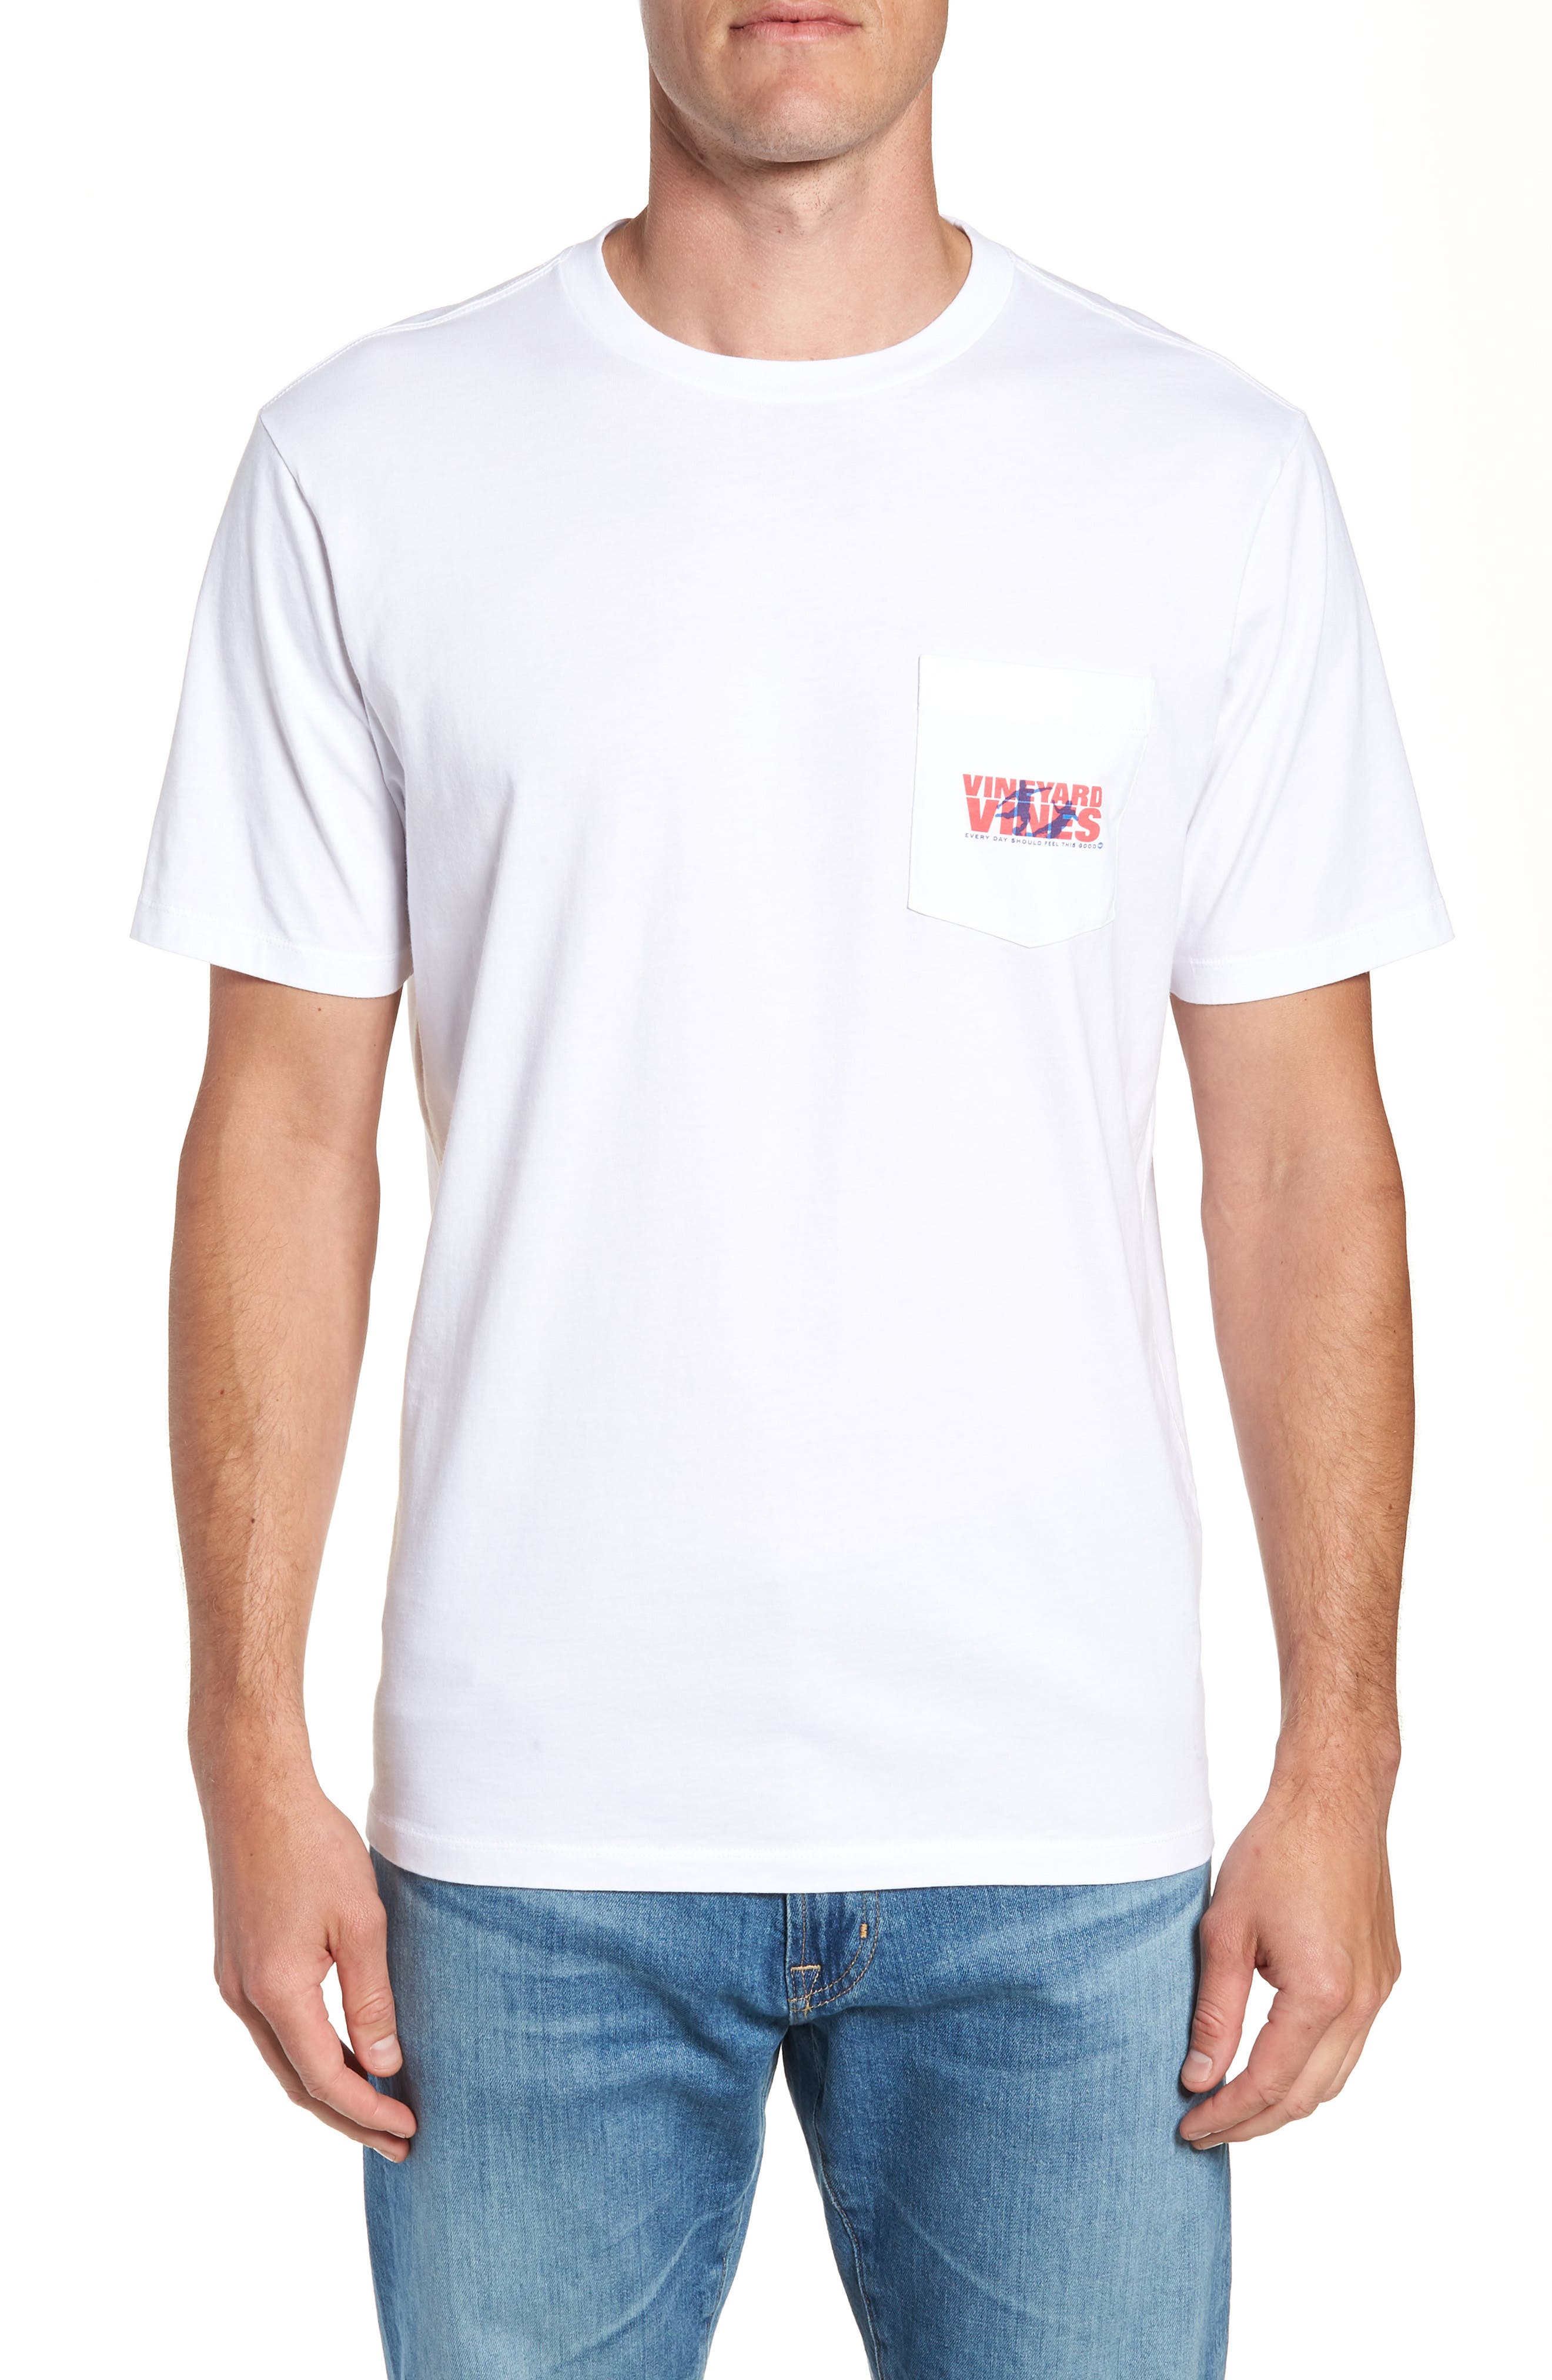 Knockout Soccer T-Shirt,                             Main thumbnail 1, color,                             100